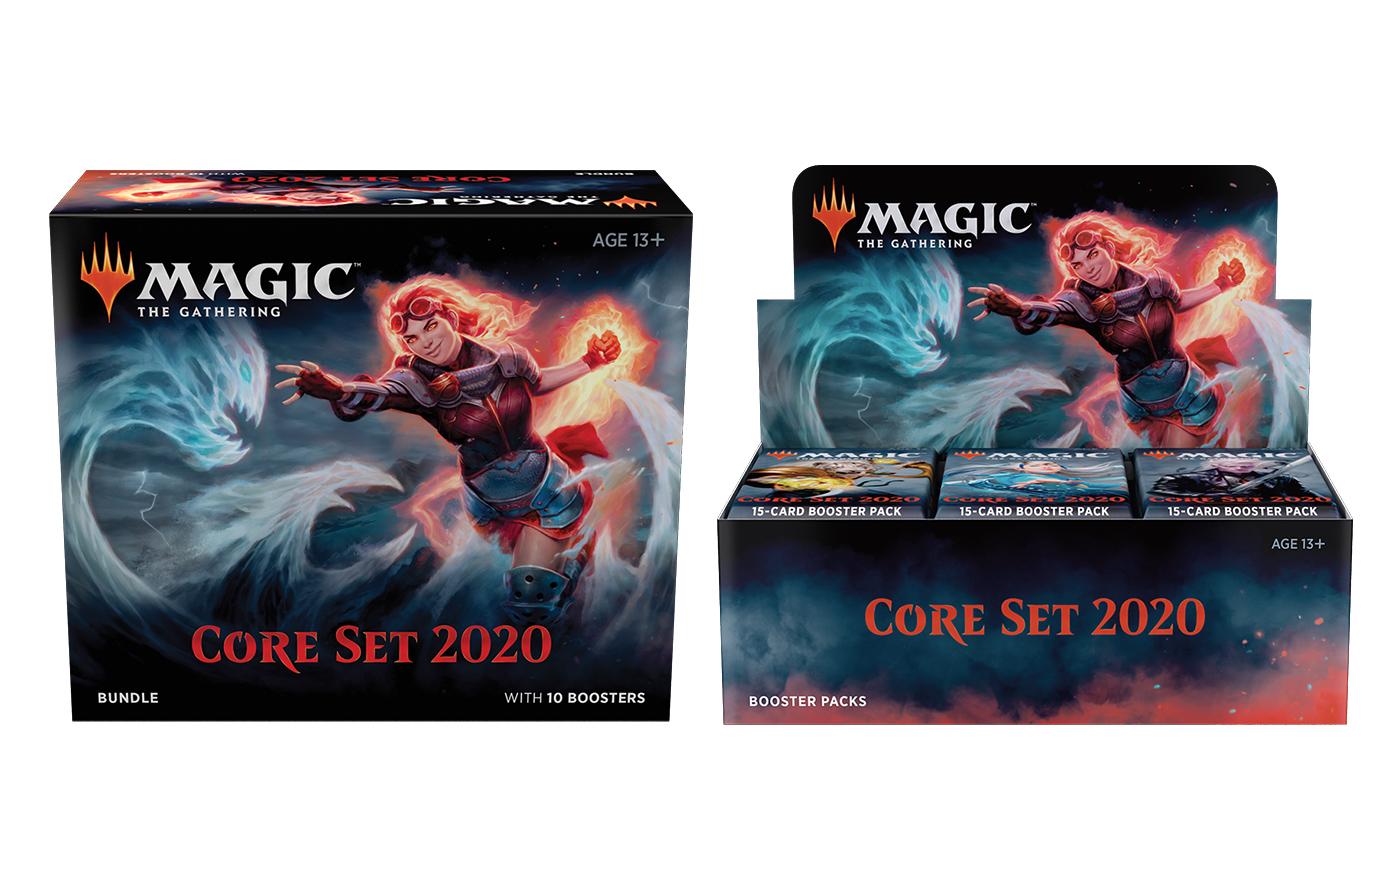 Core Set 2020 Combo Pack